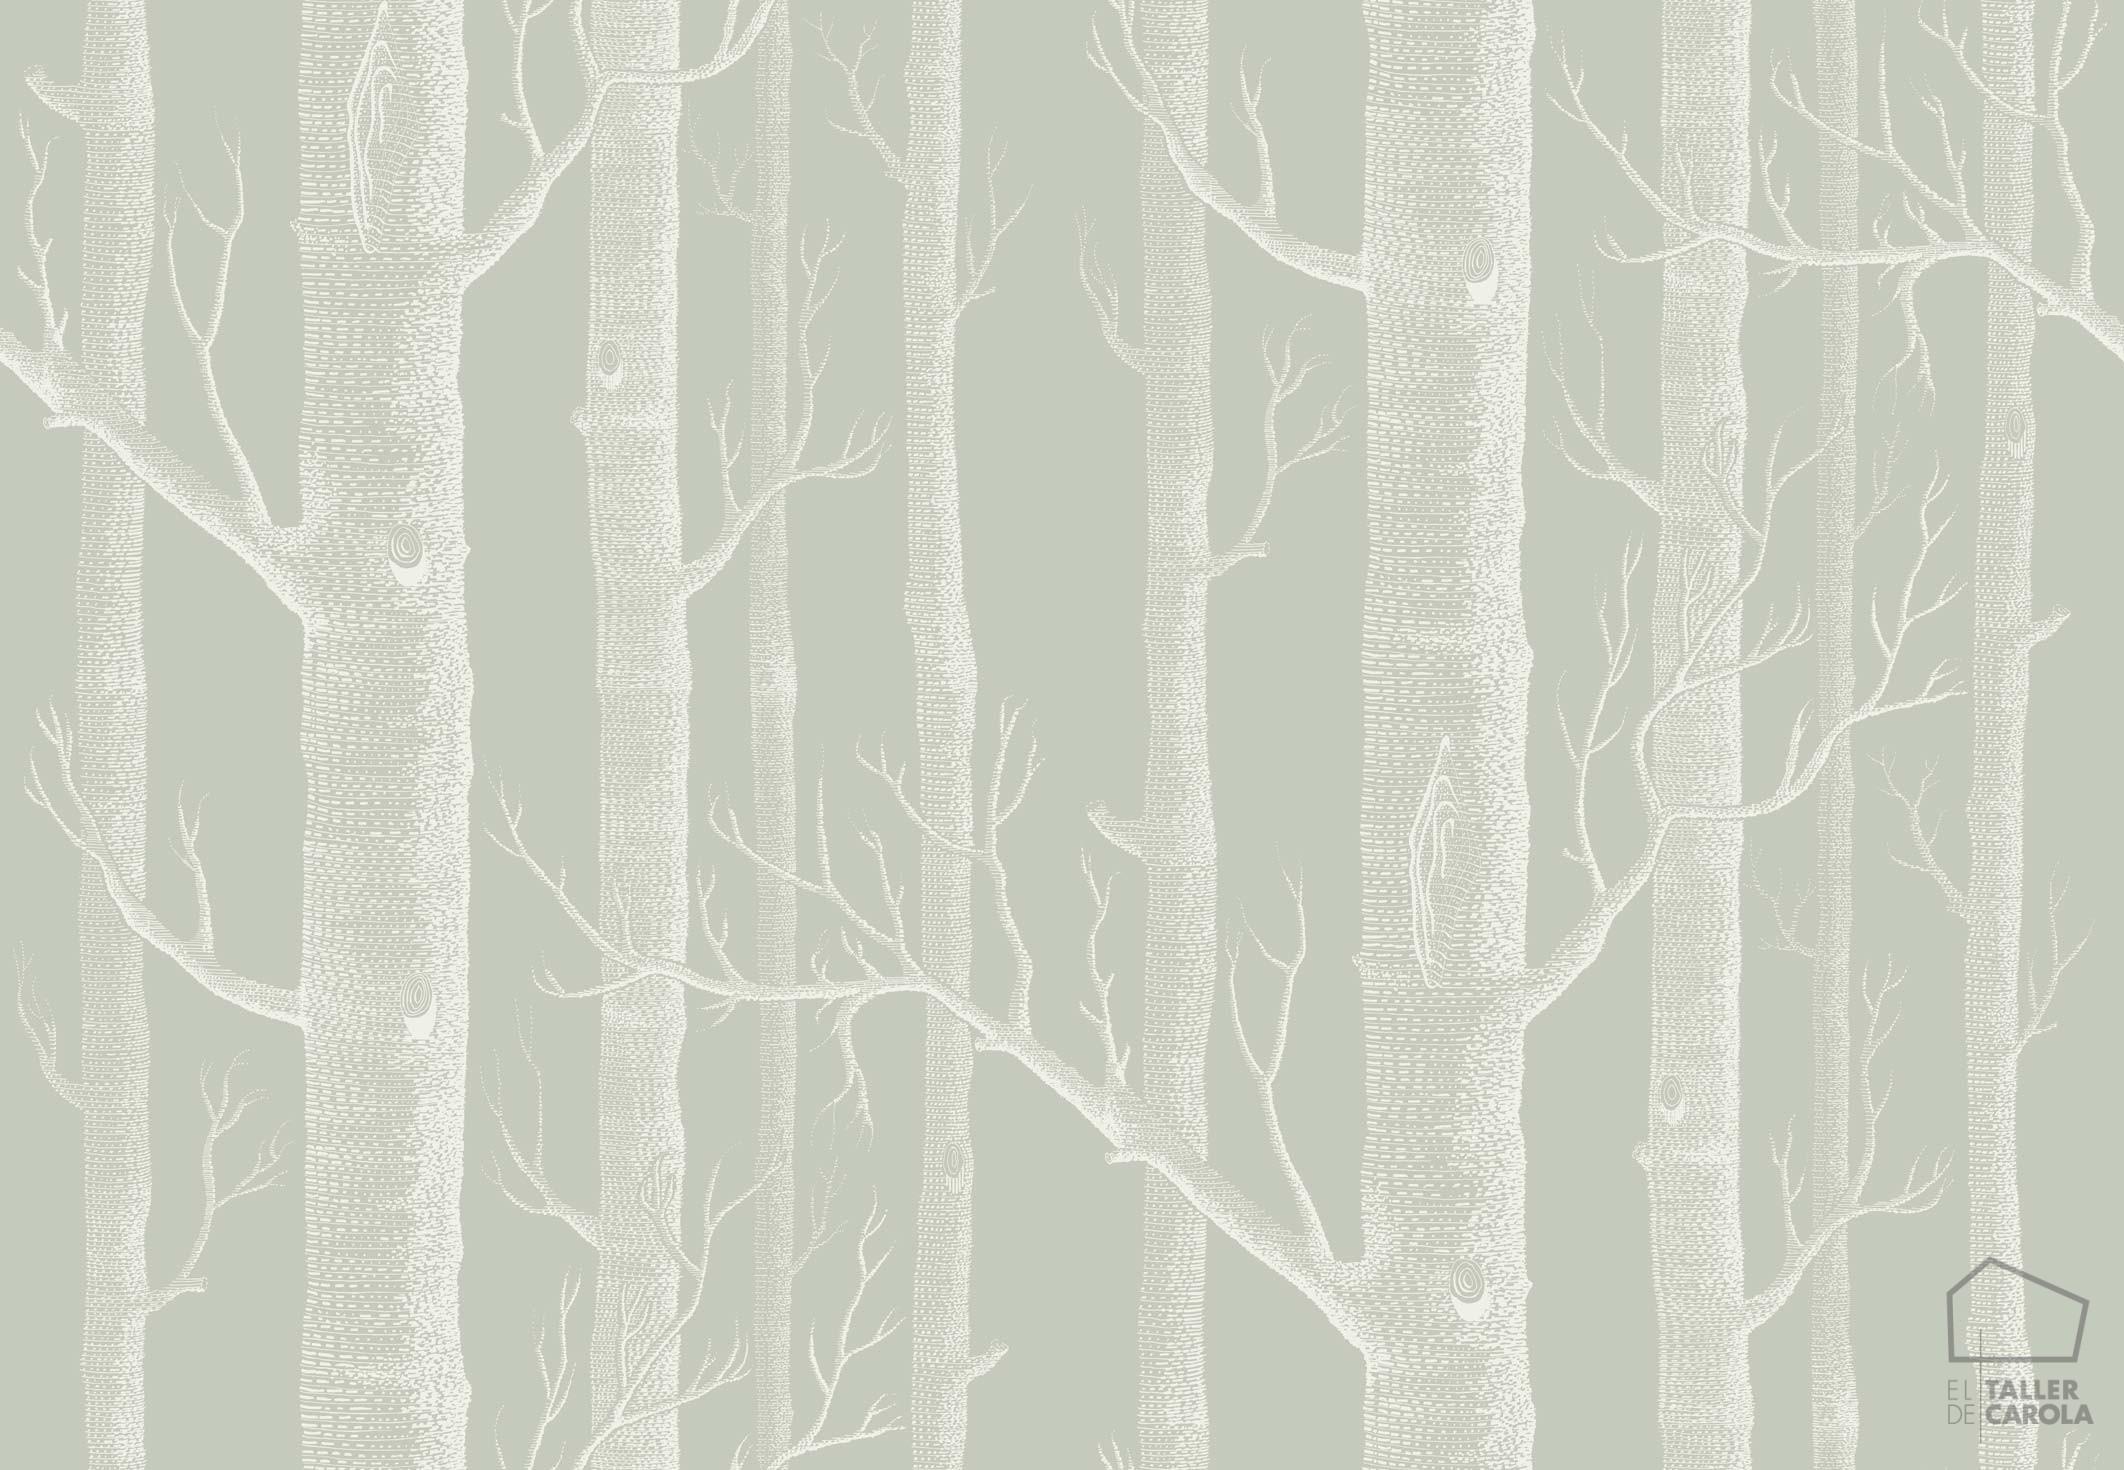 083icowoo112-3013-papeles-pintados-arboles-bosque-verde